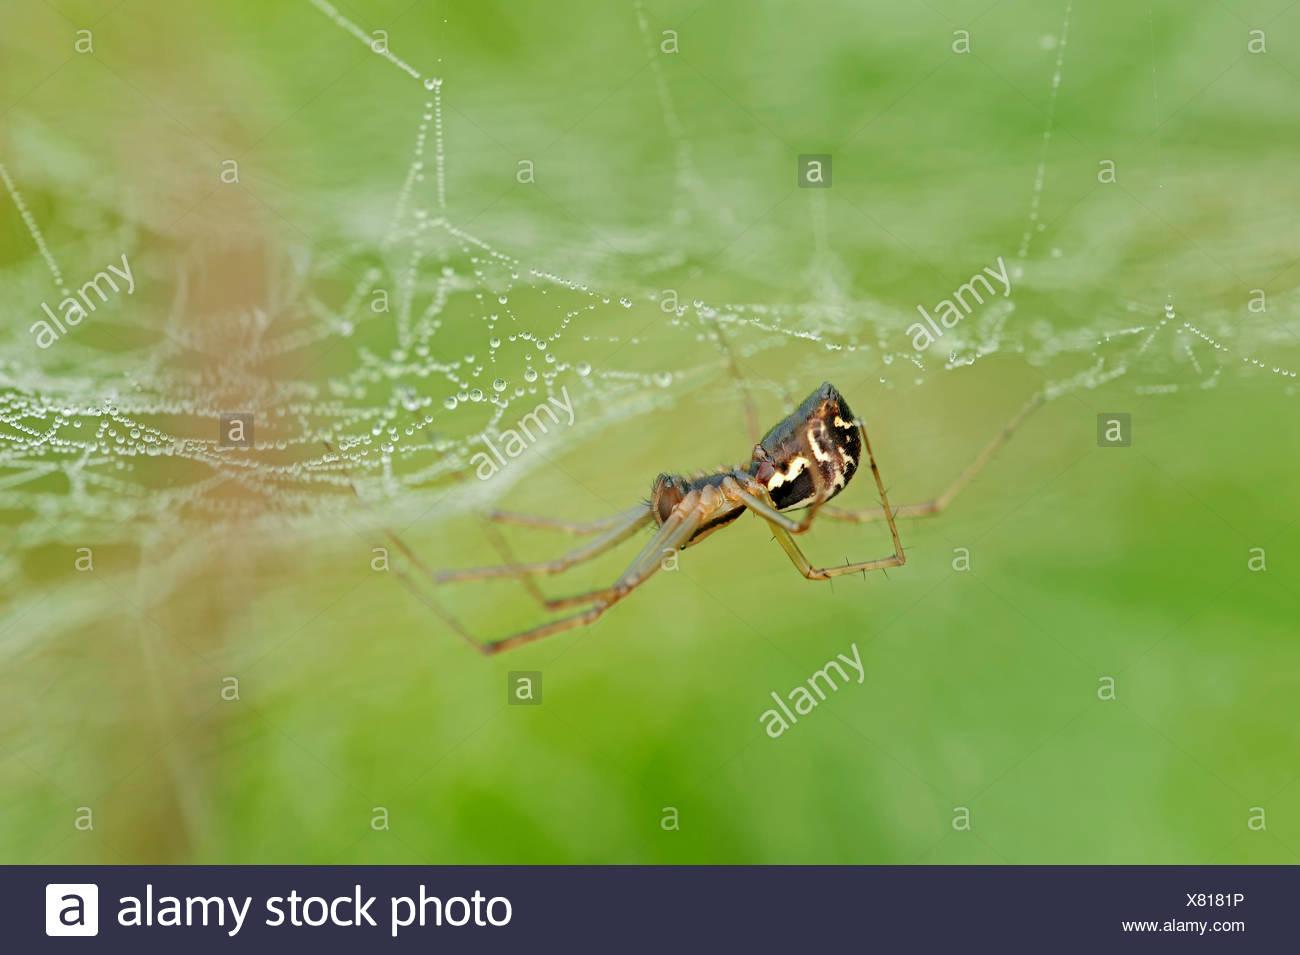 European Sheet-web Spider (Linyphia triangularis), in a web, North Rhine-Westphalia, Germany - Stock Image